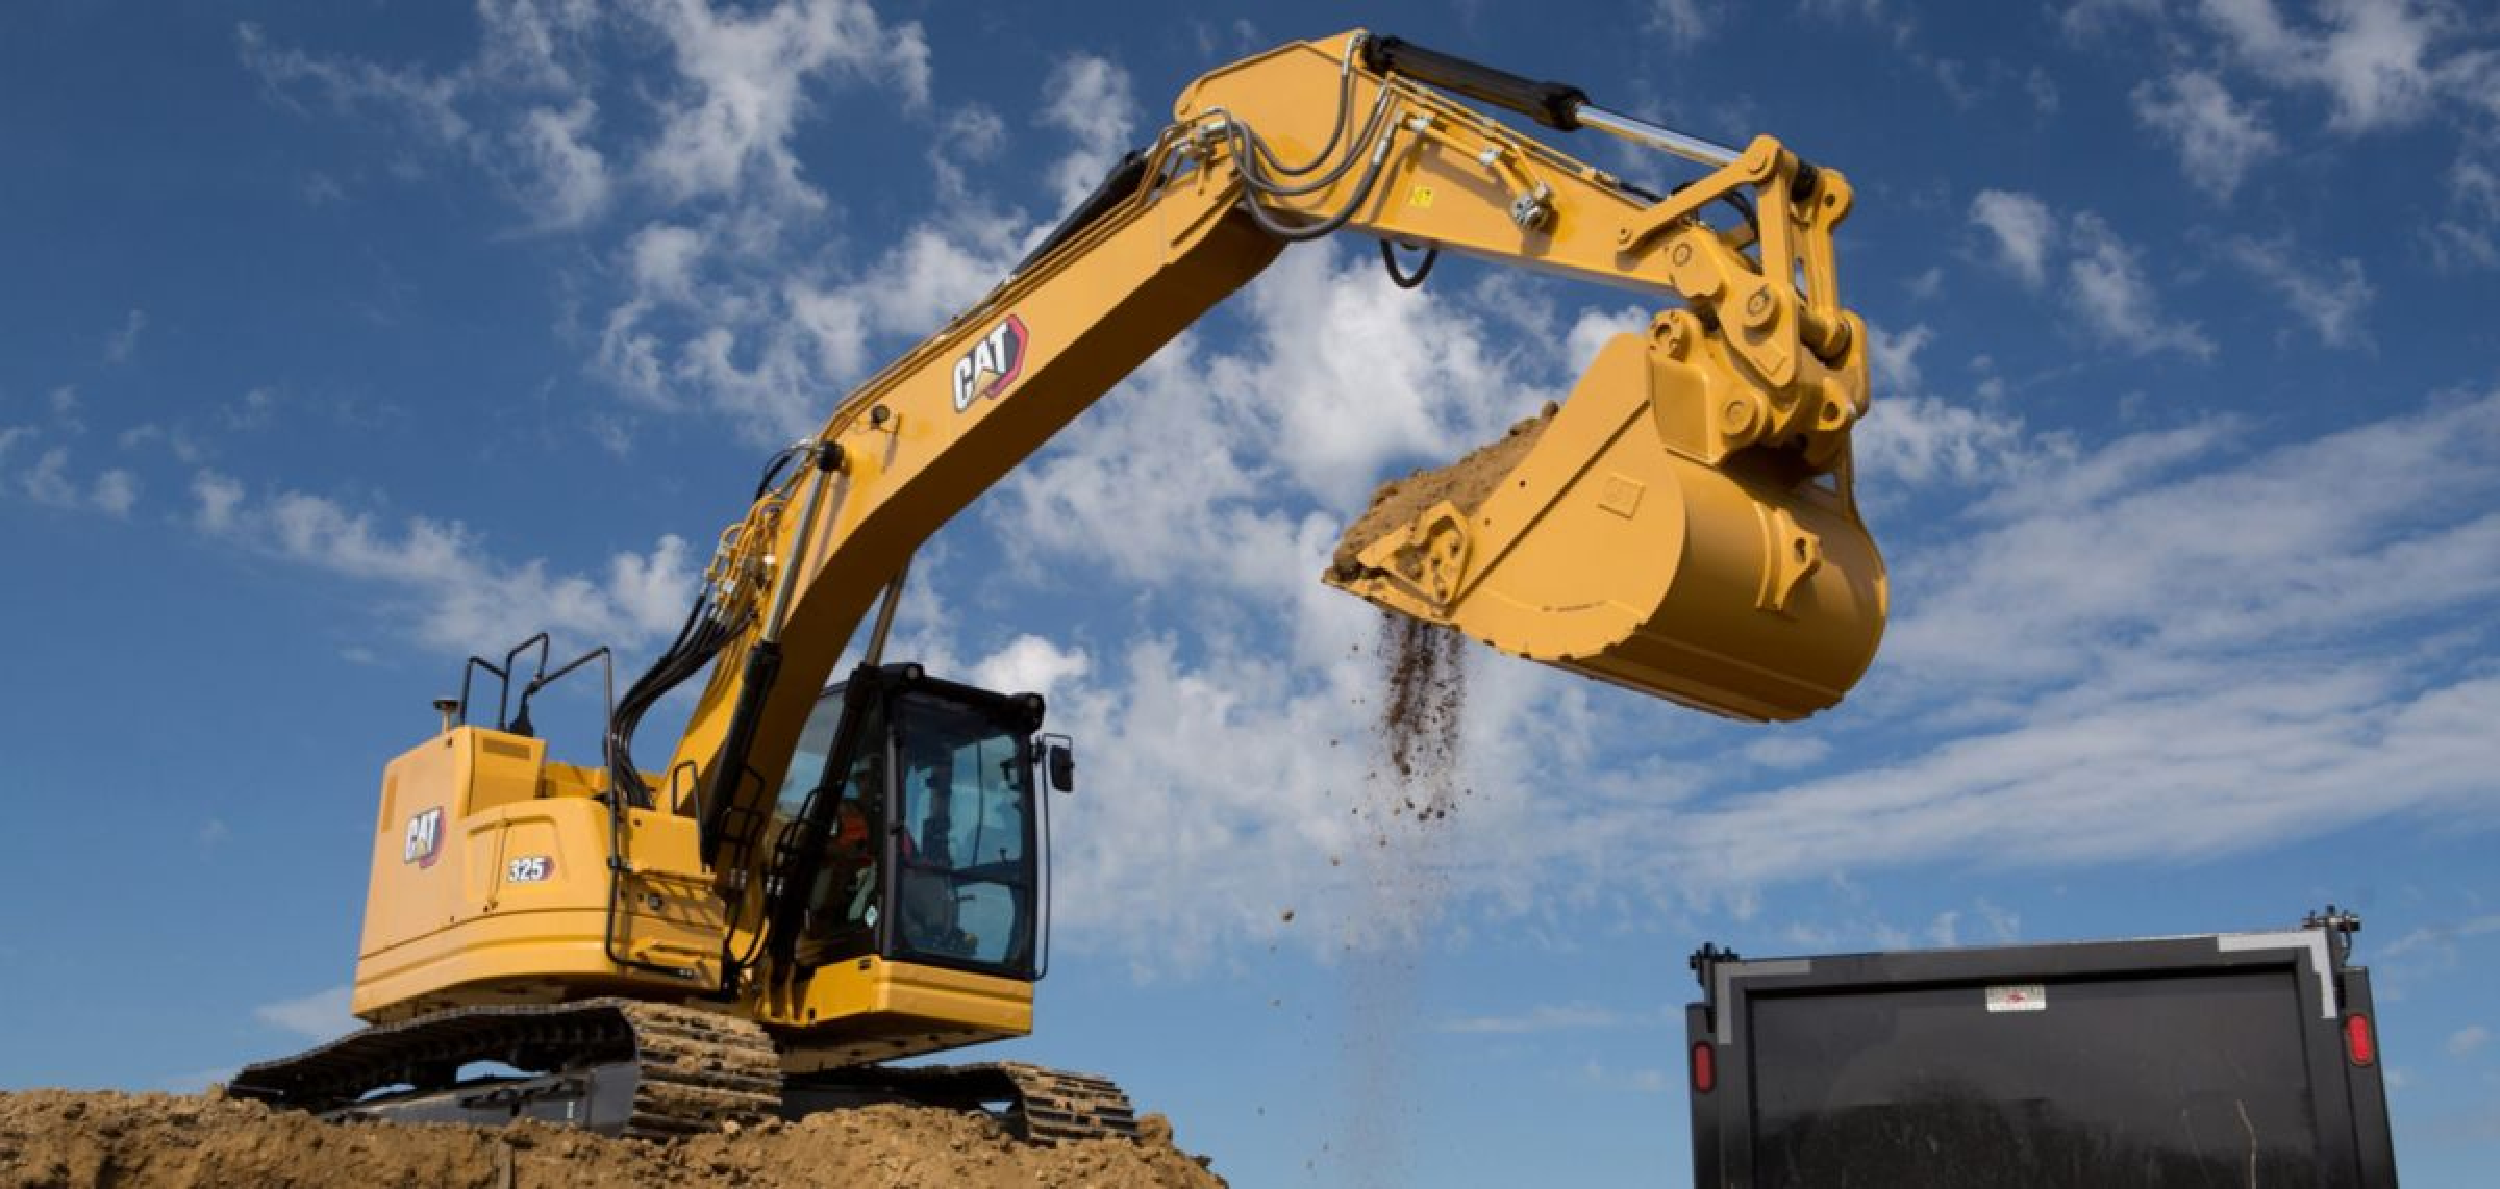 325 Excavator